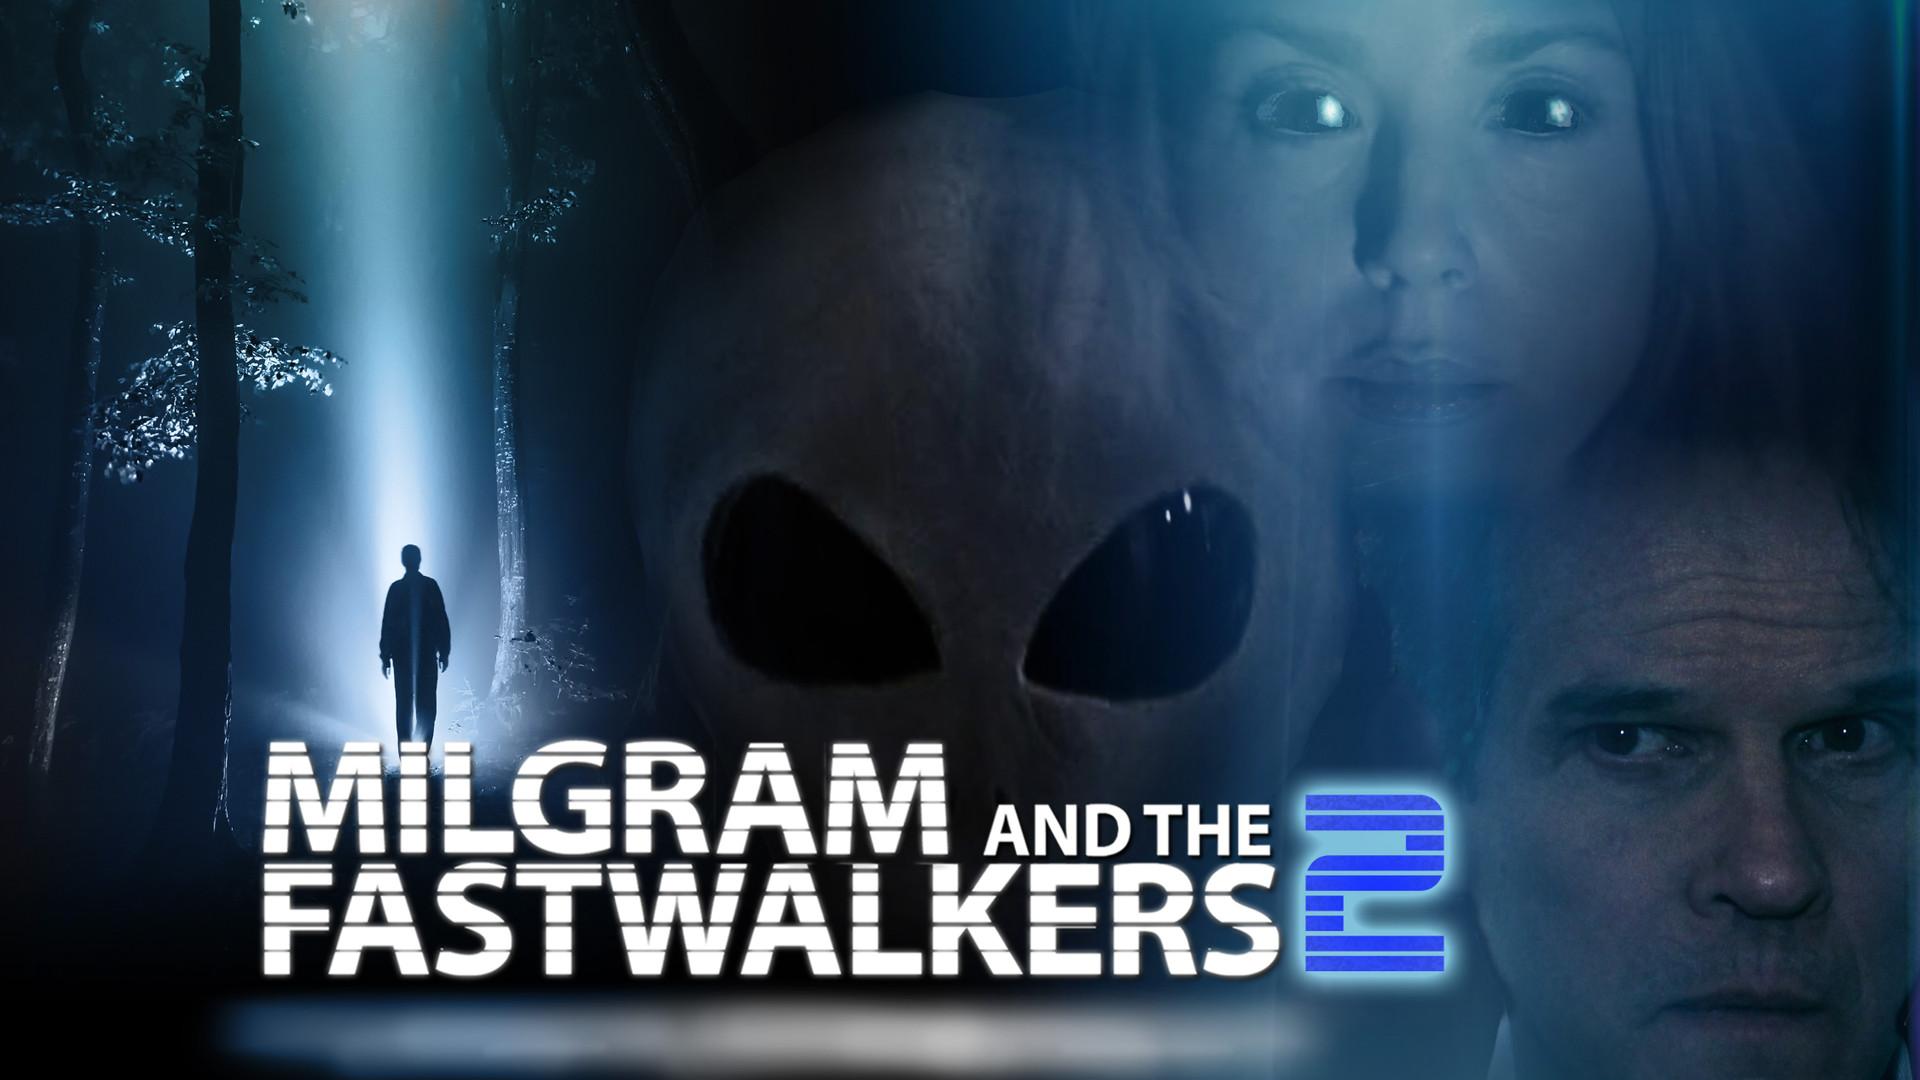 Milgram and the Fastwalkers 2